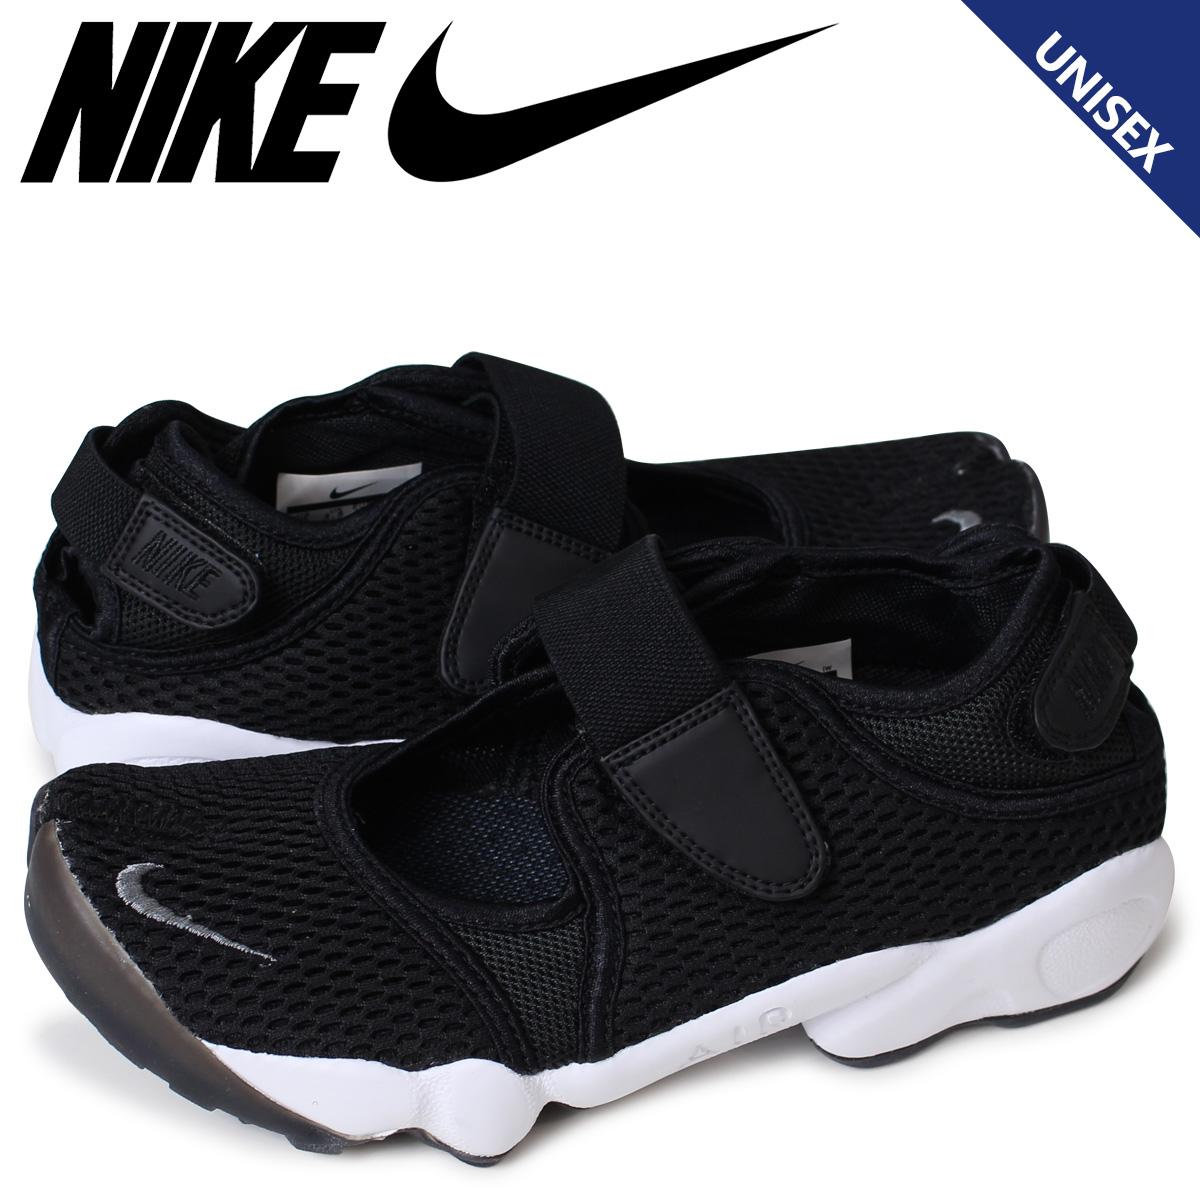 2b71b13774e8 SneaK Online Shop  Nike NIKE airlift Lady s sneakers WMNS AIR RIFT ...